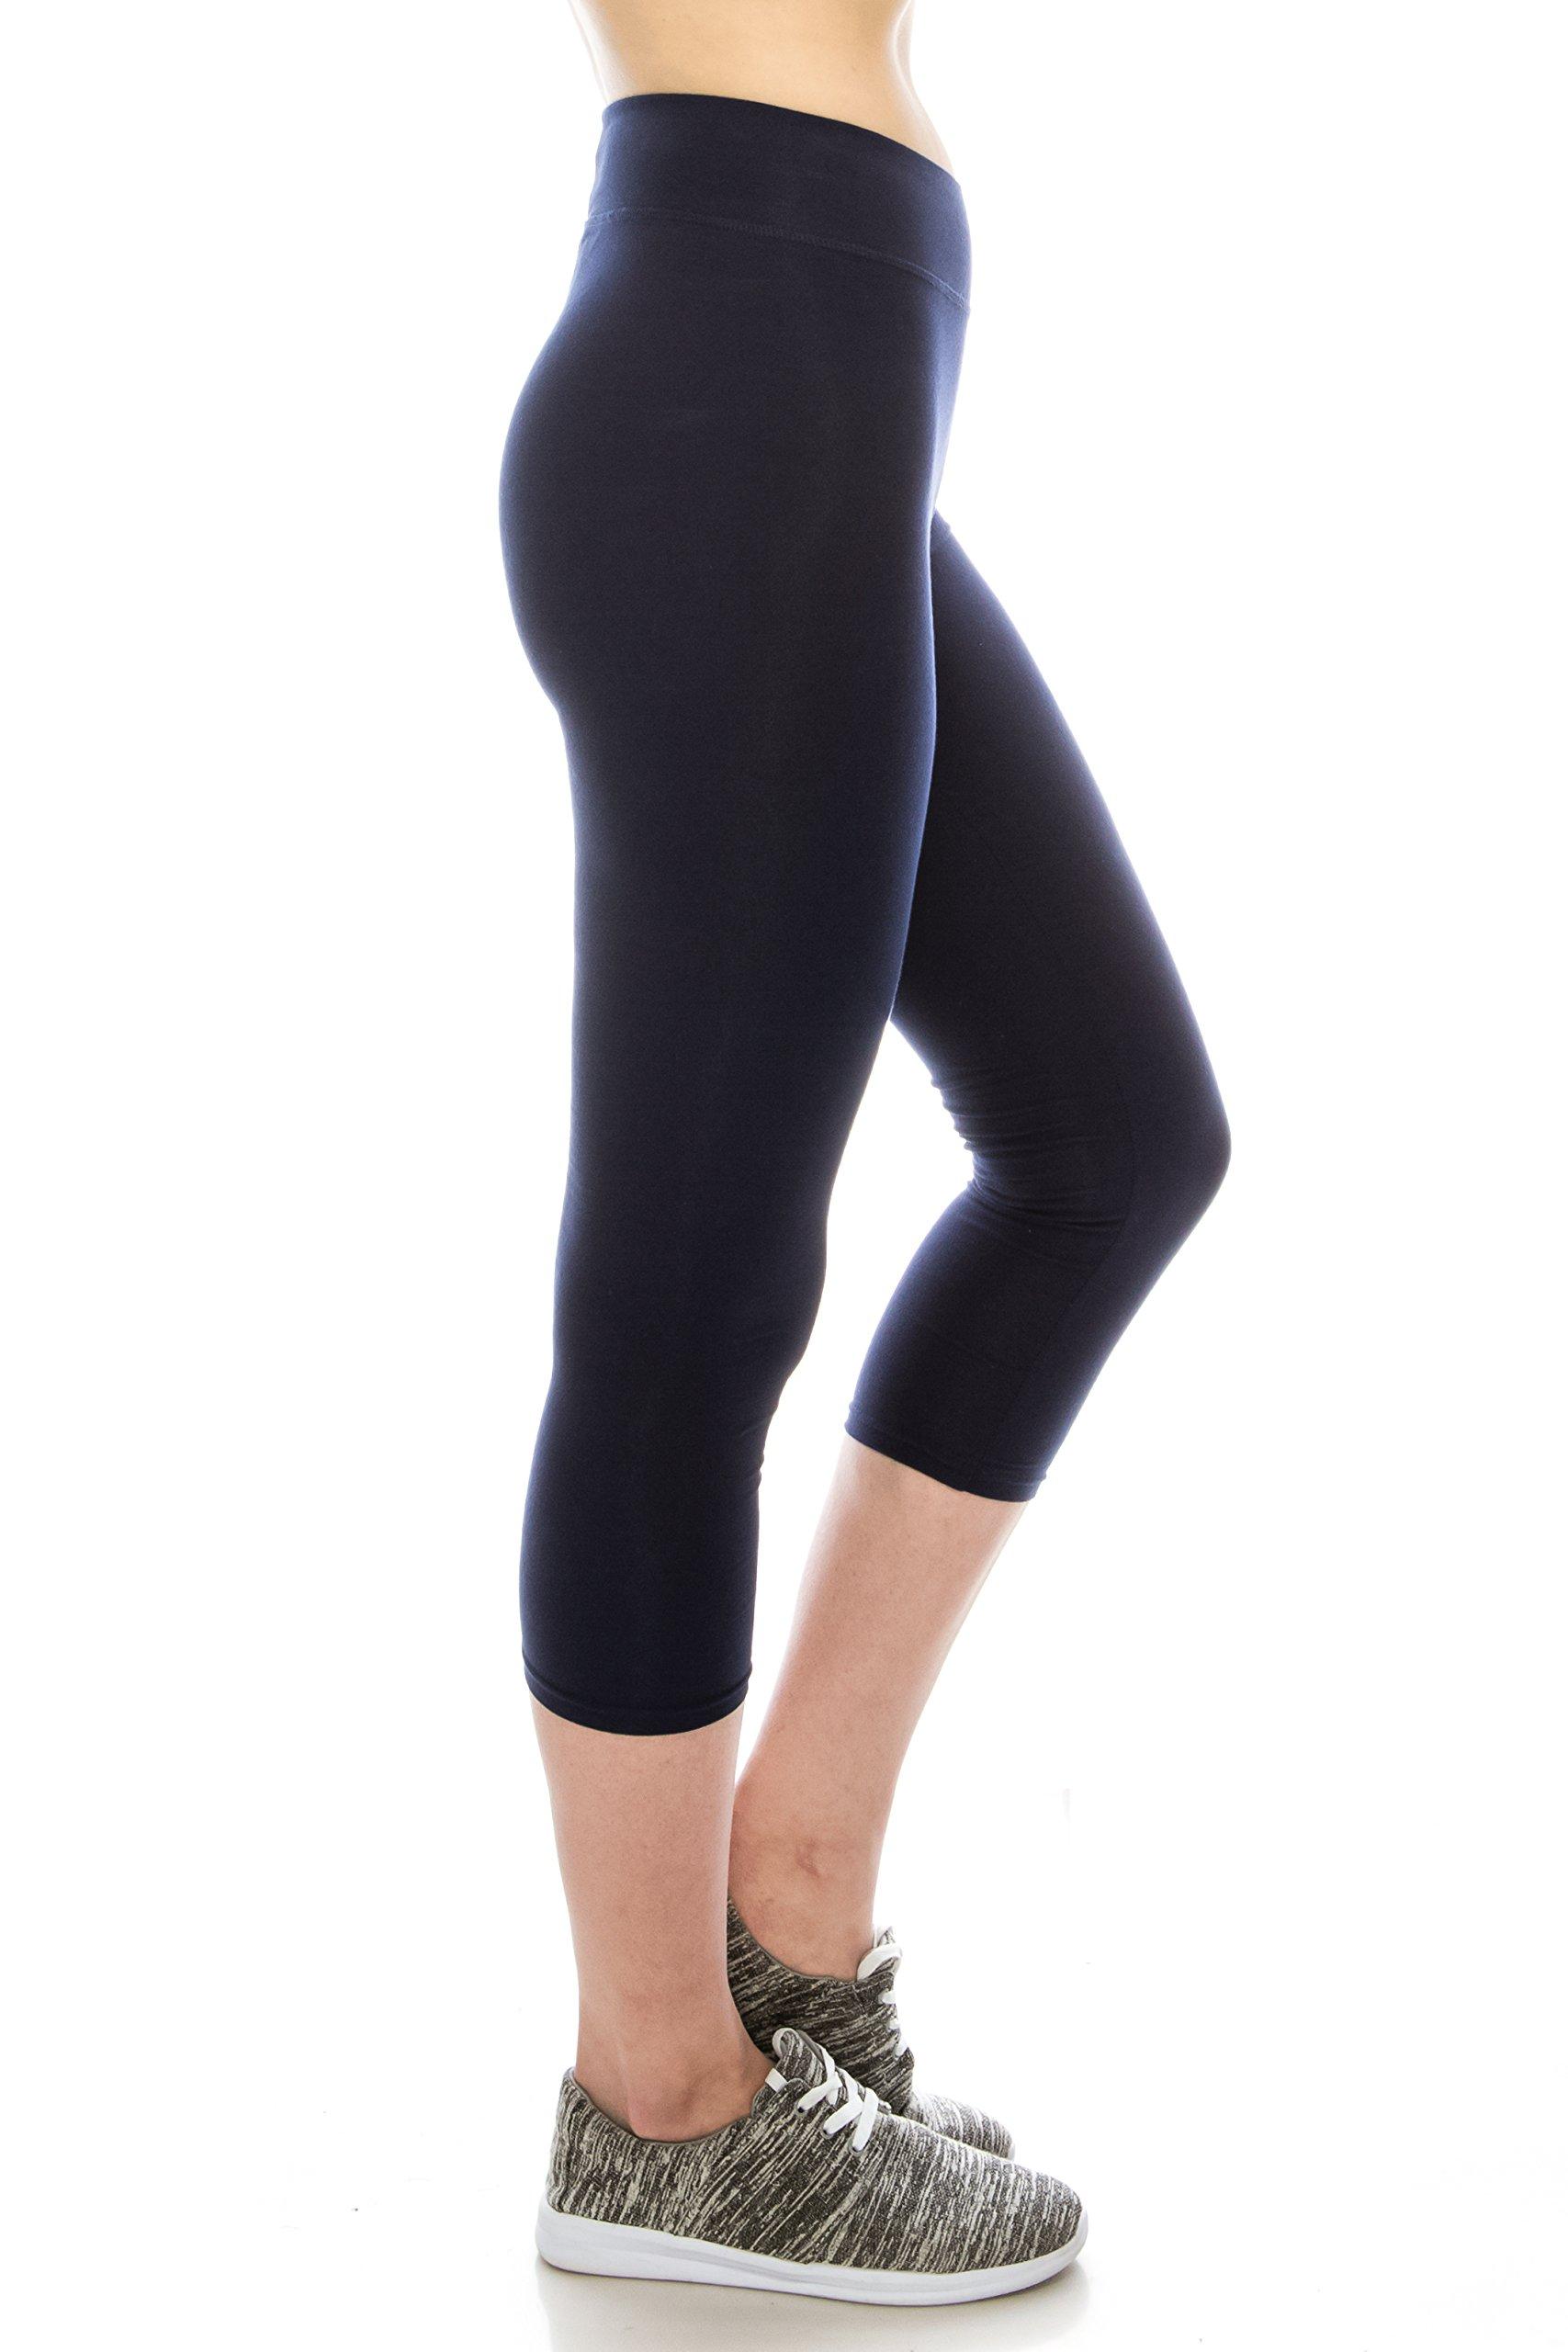 Cotton Spandex Basic Knit Jersey Capri Leggings for Women Navy XL